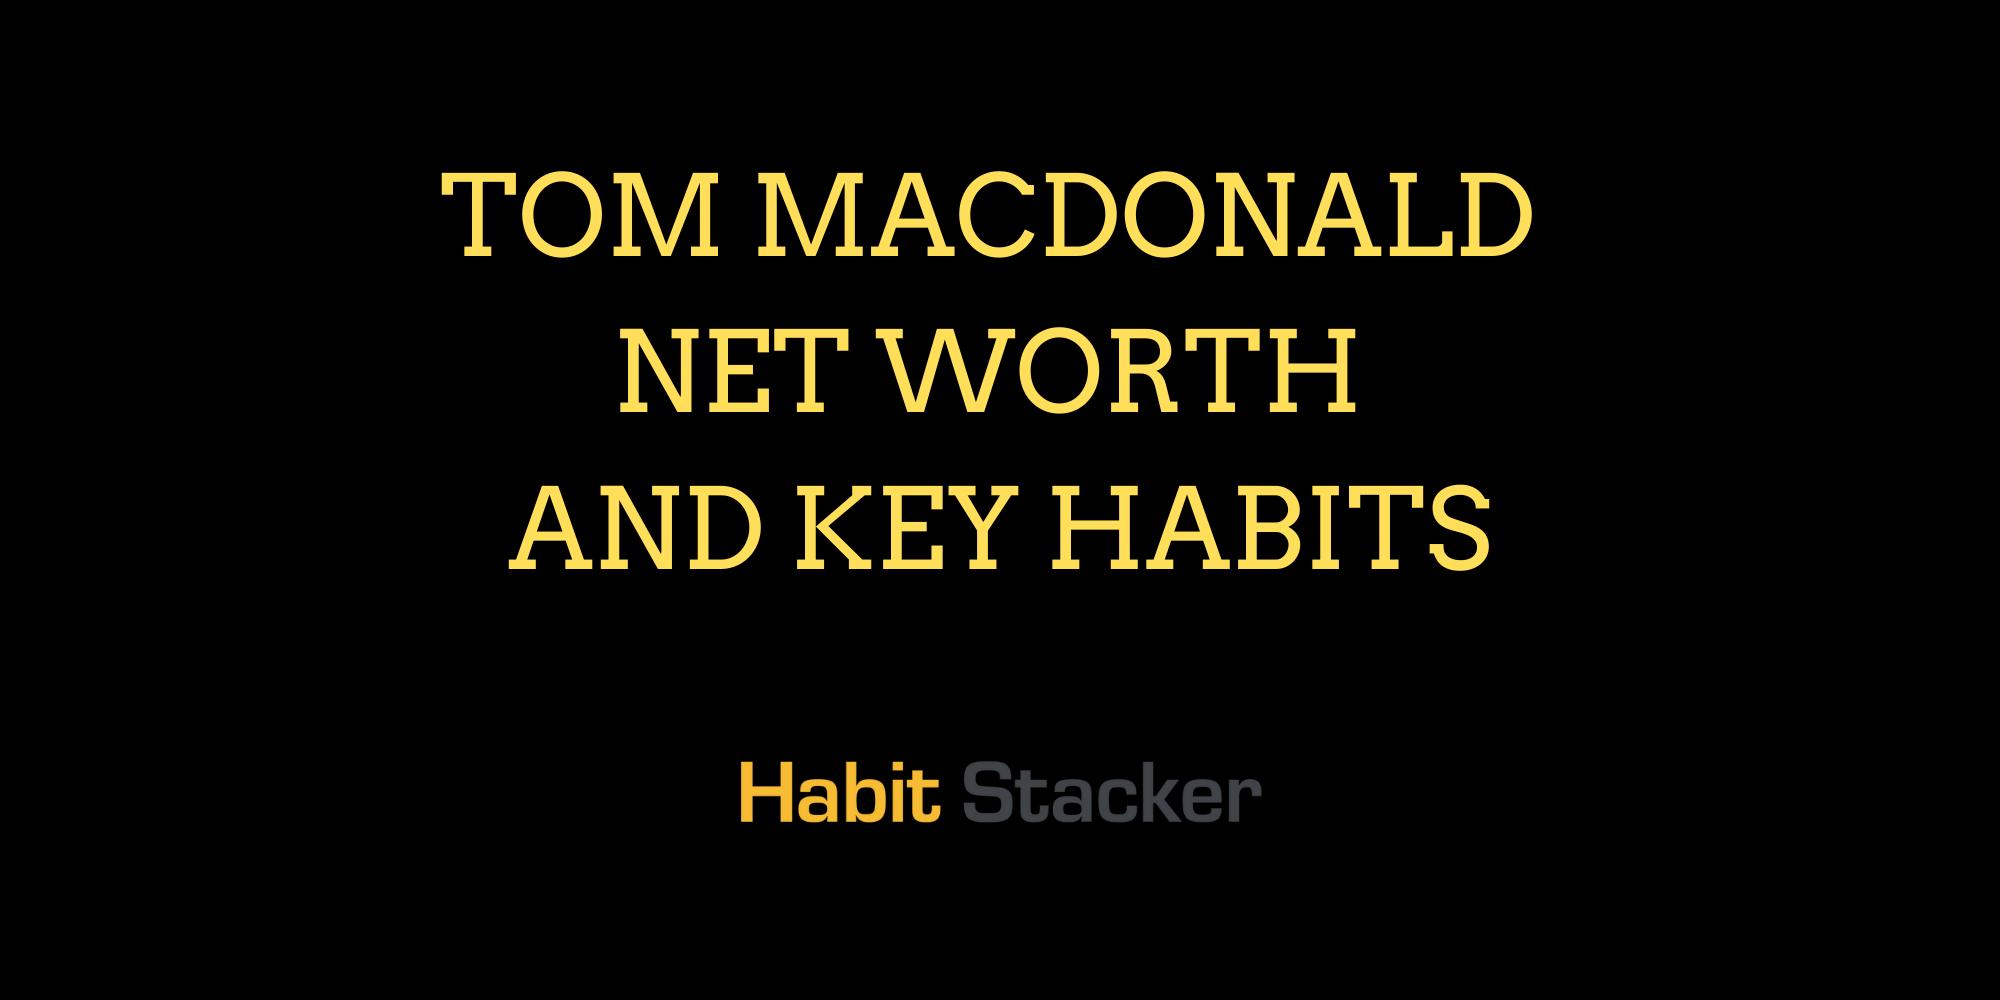 Tom Macdonald Net Worth and Key Habits